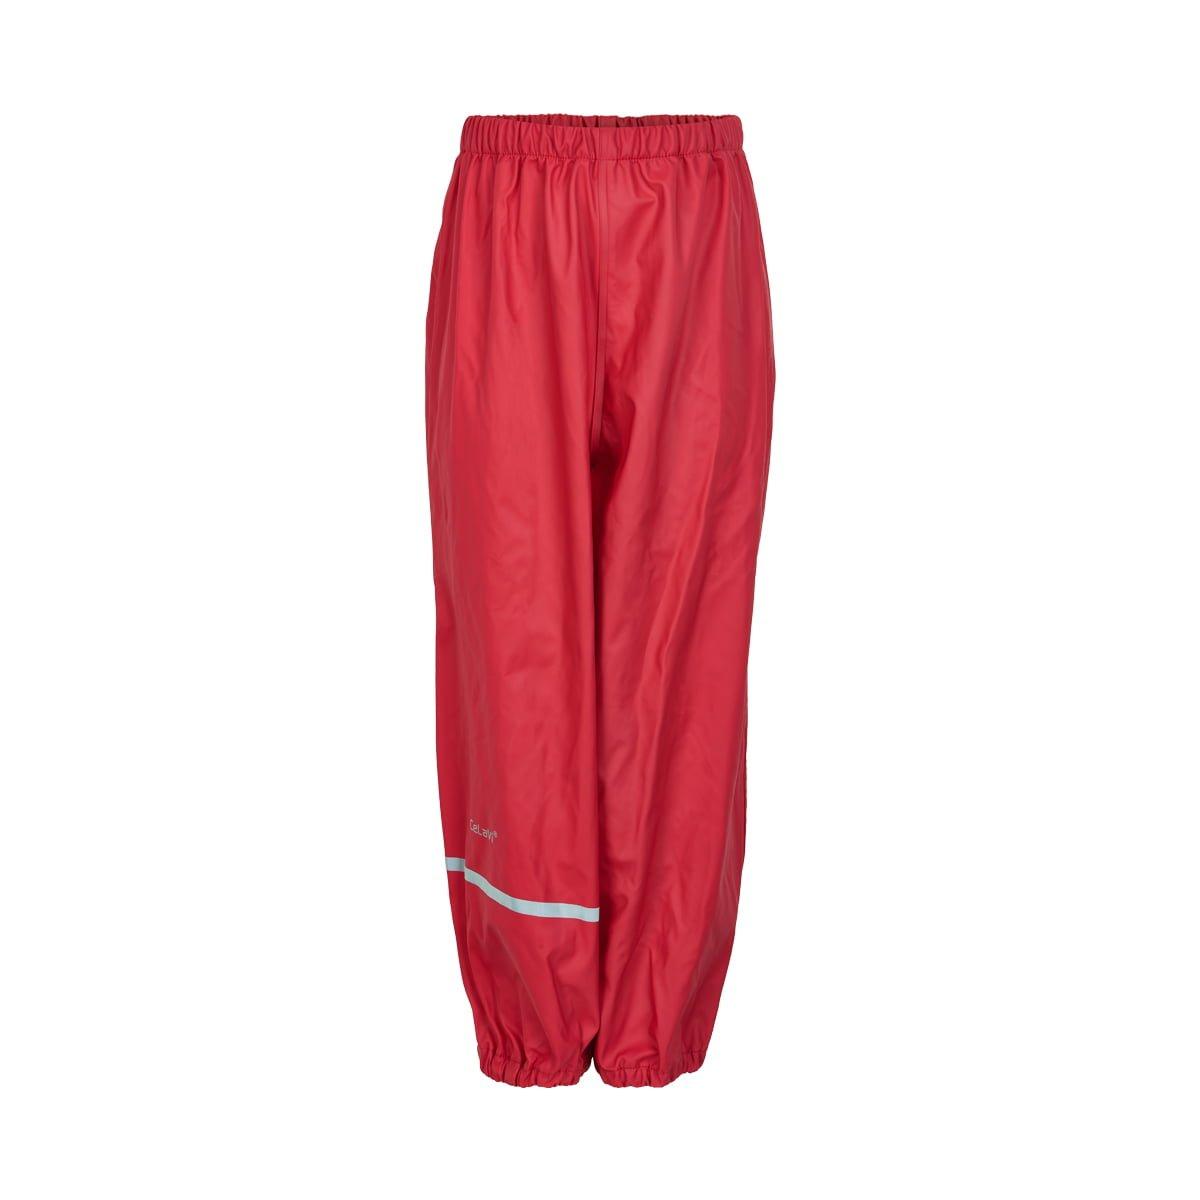 Pantaloni de ploaie și vânt (impermeabil) red CeLaVi 1